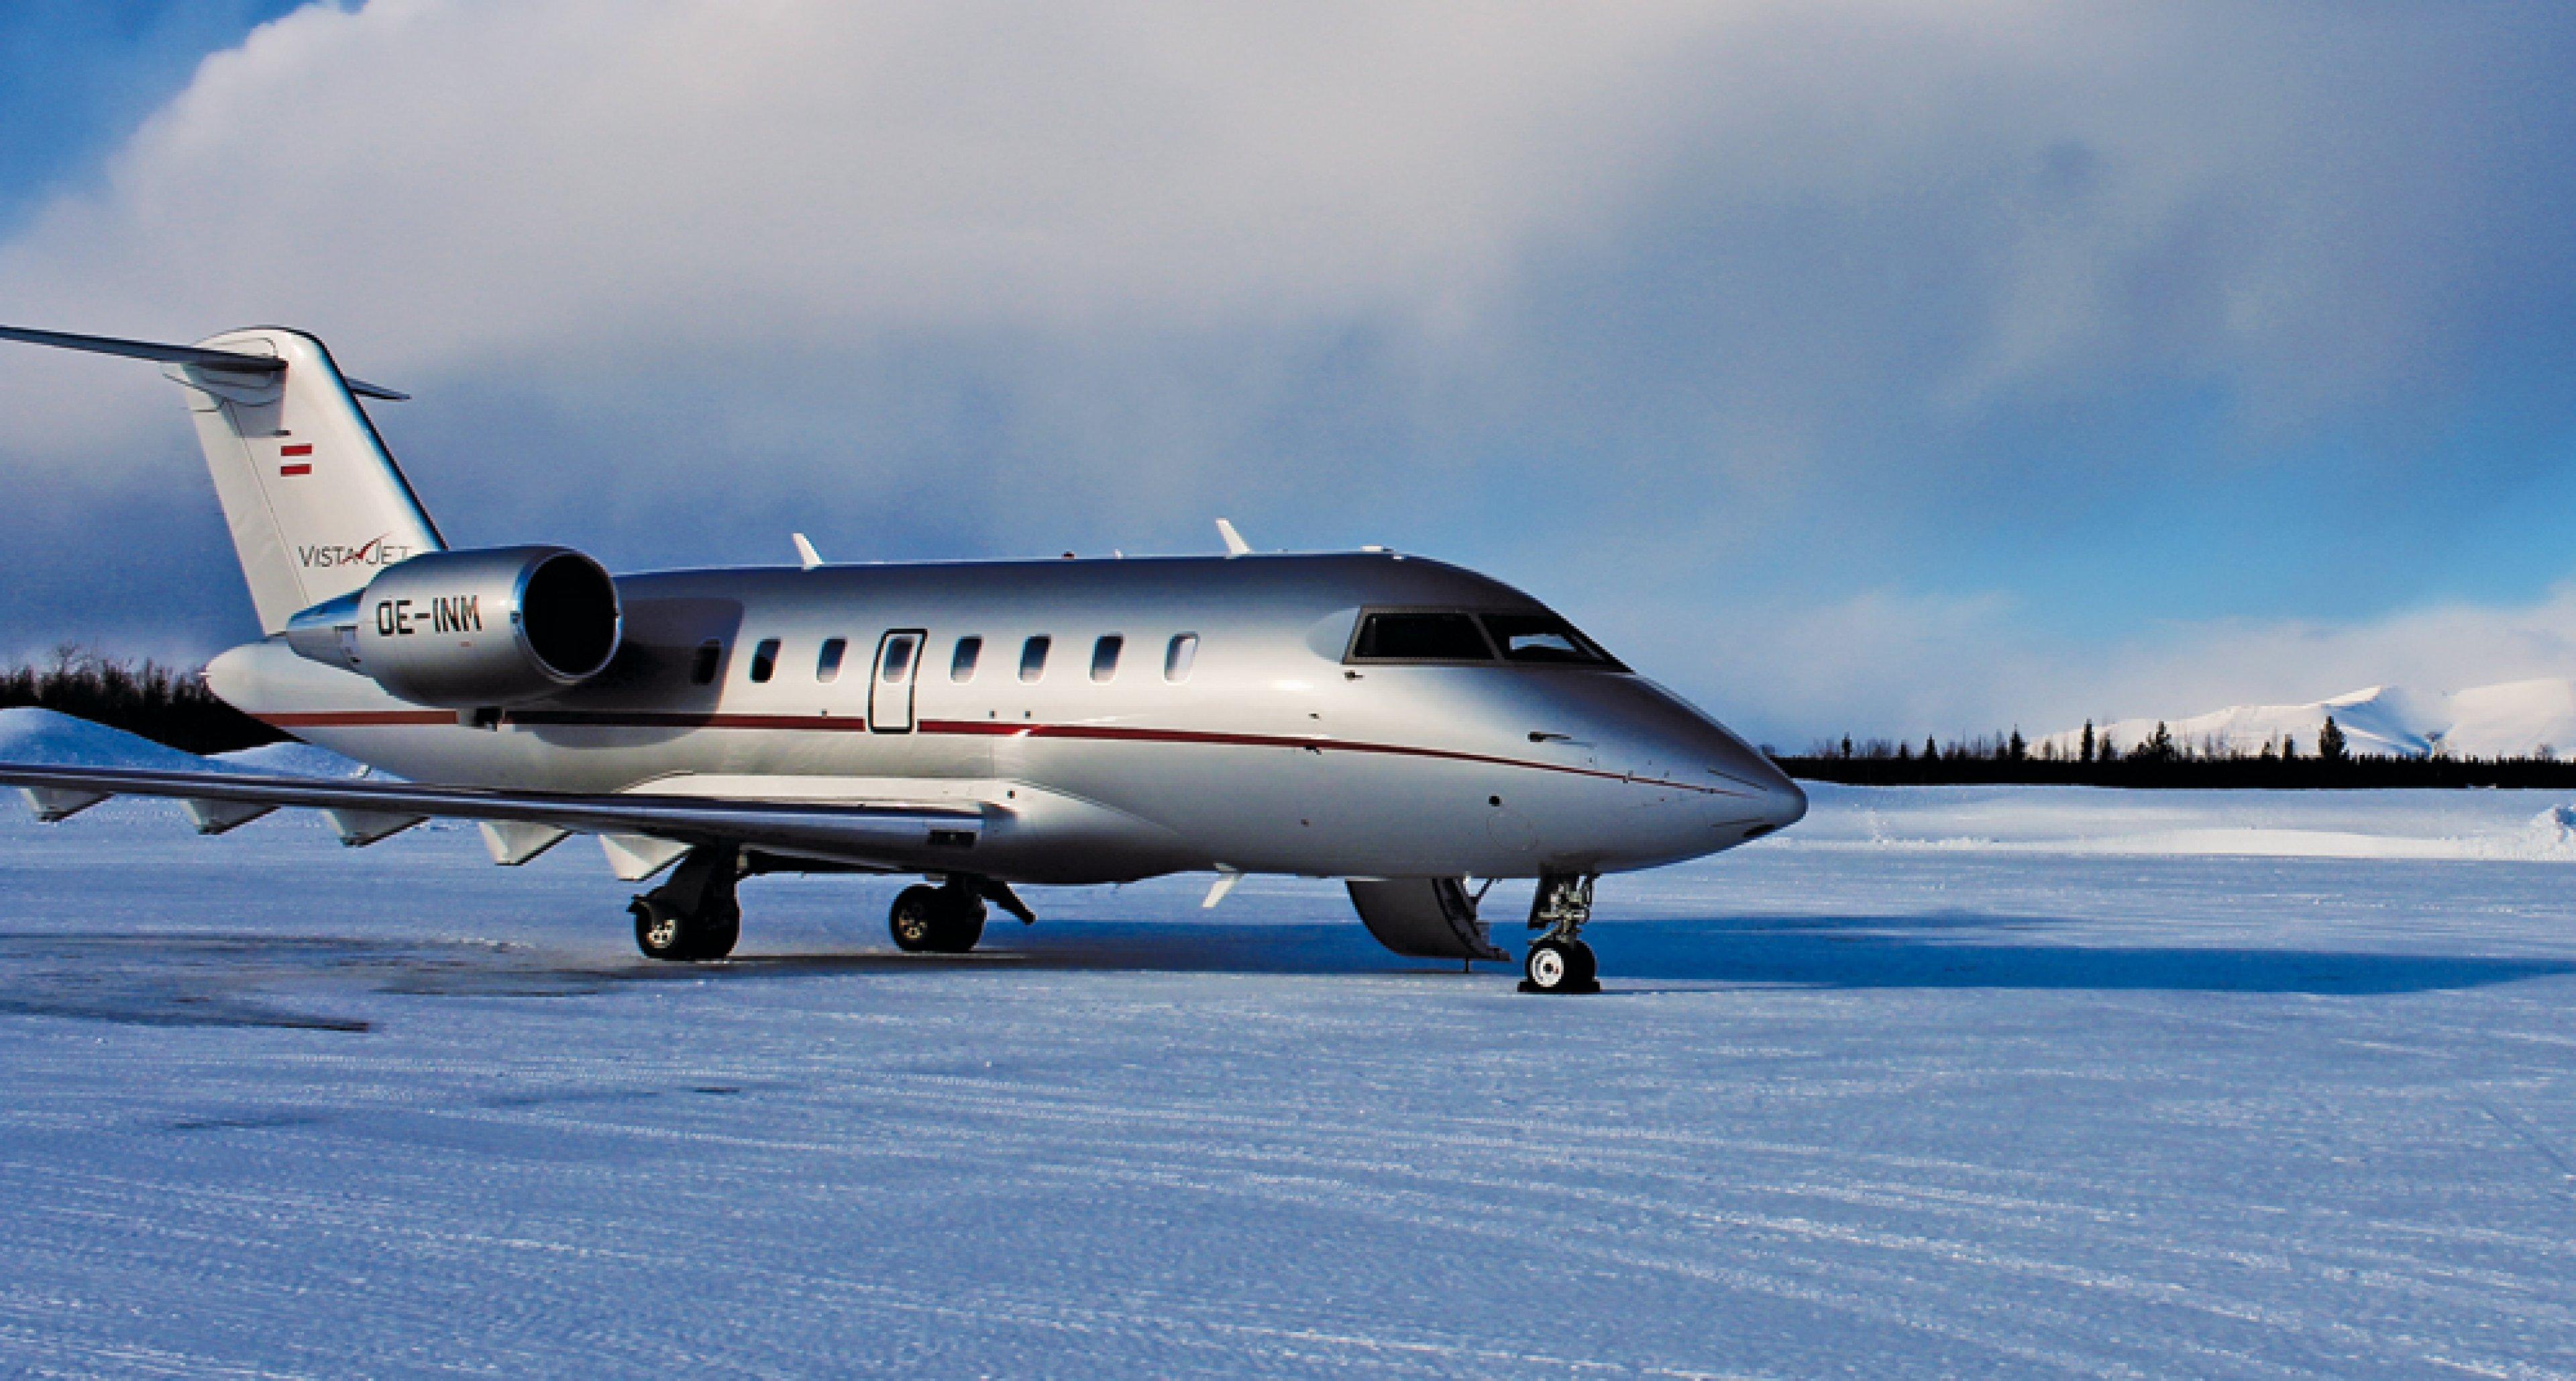 A VistaJet Bombardier Challenger 605 lands in the Russian Arctic, Kyle Brown © VistaJet